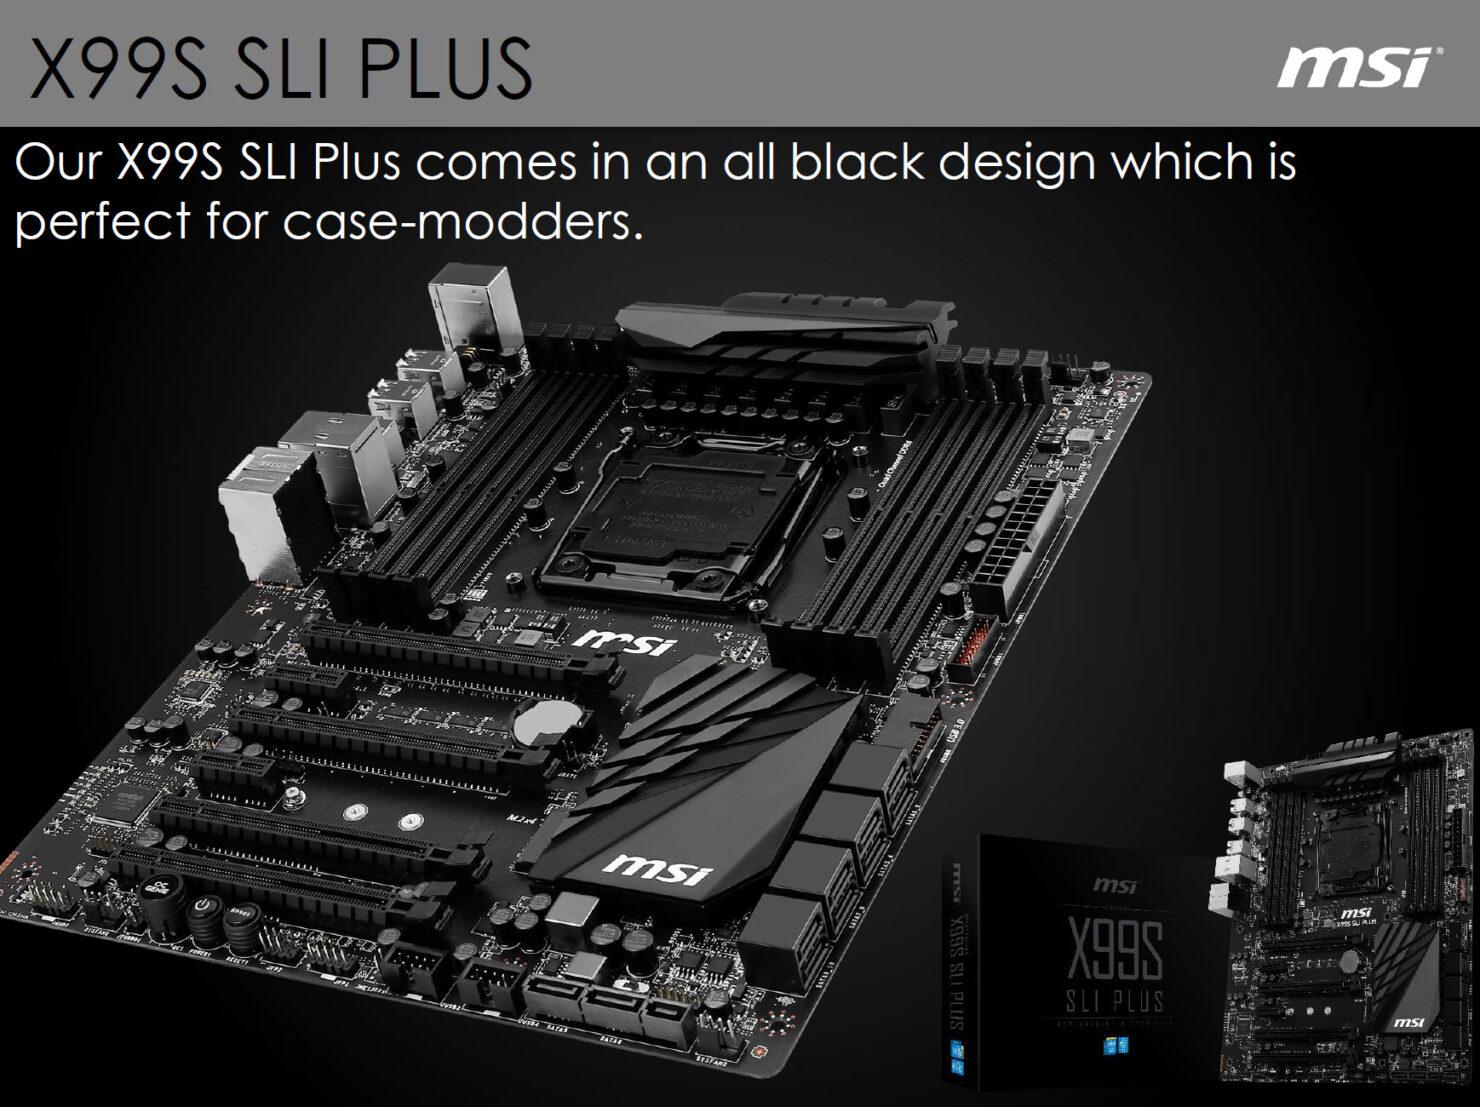 msi-x99-motherboard-press-slides_16